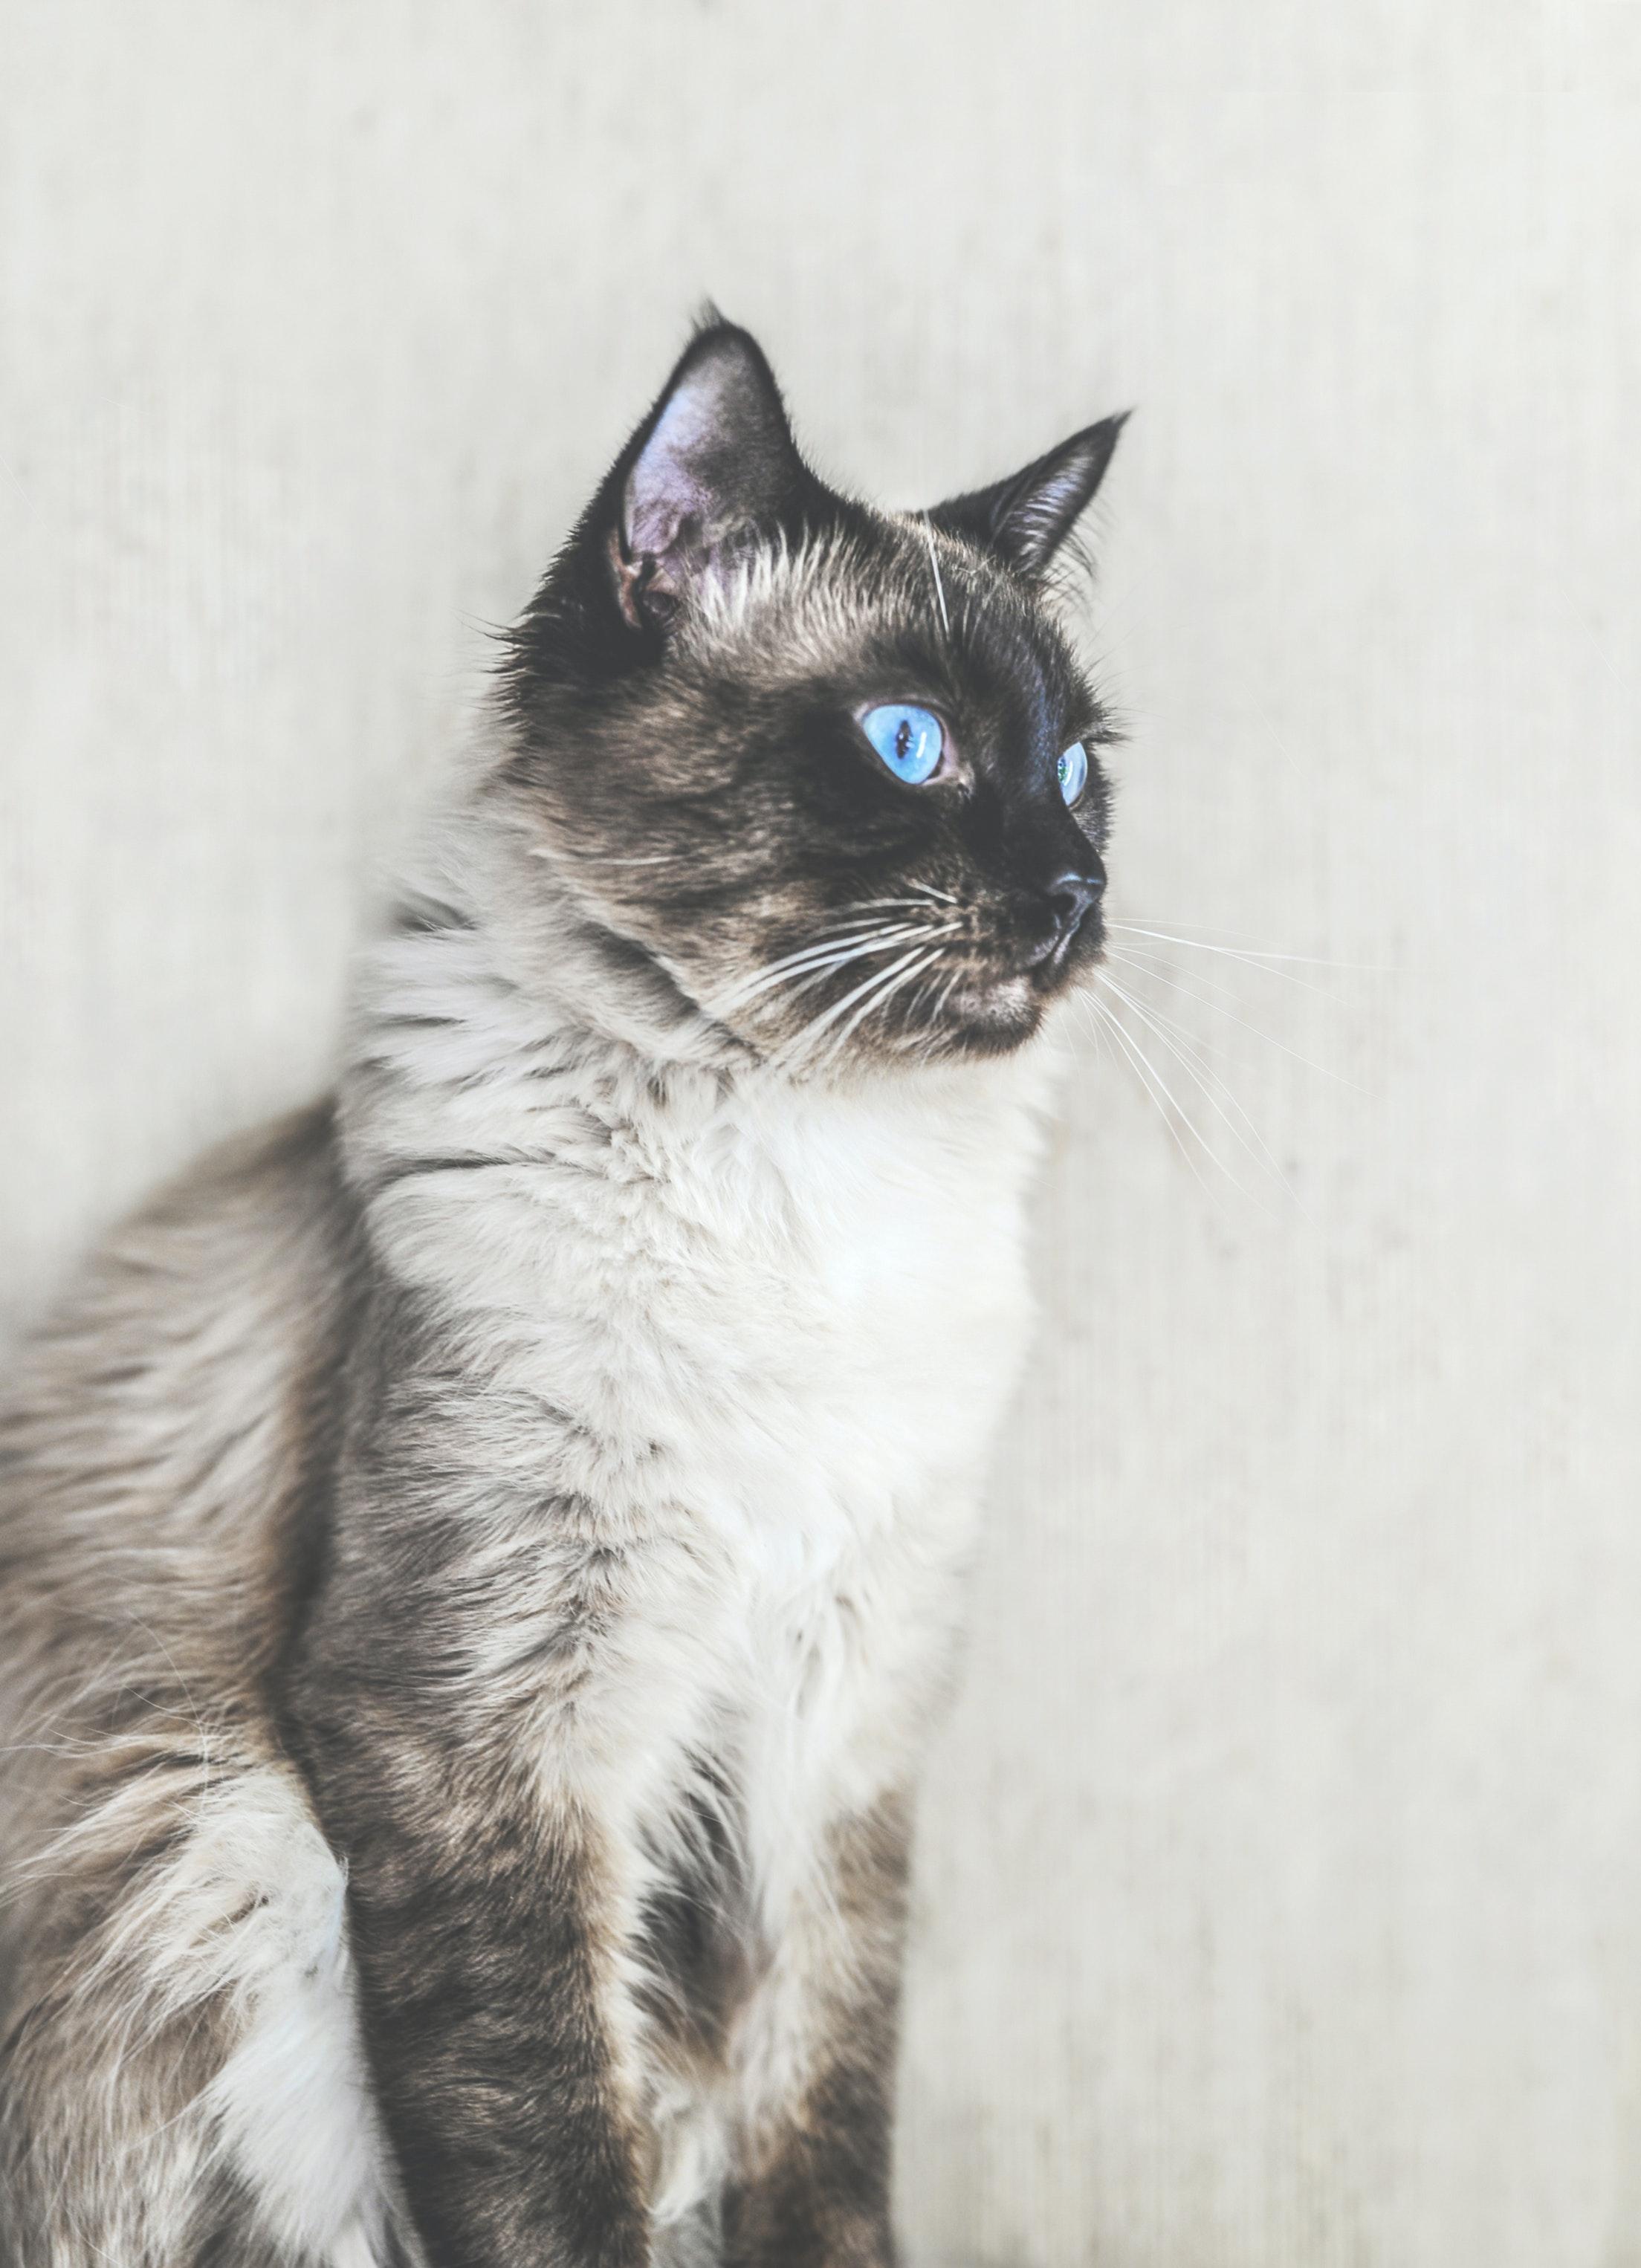 pexels monicore 2888645 - Conheça o gato Balinês